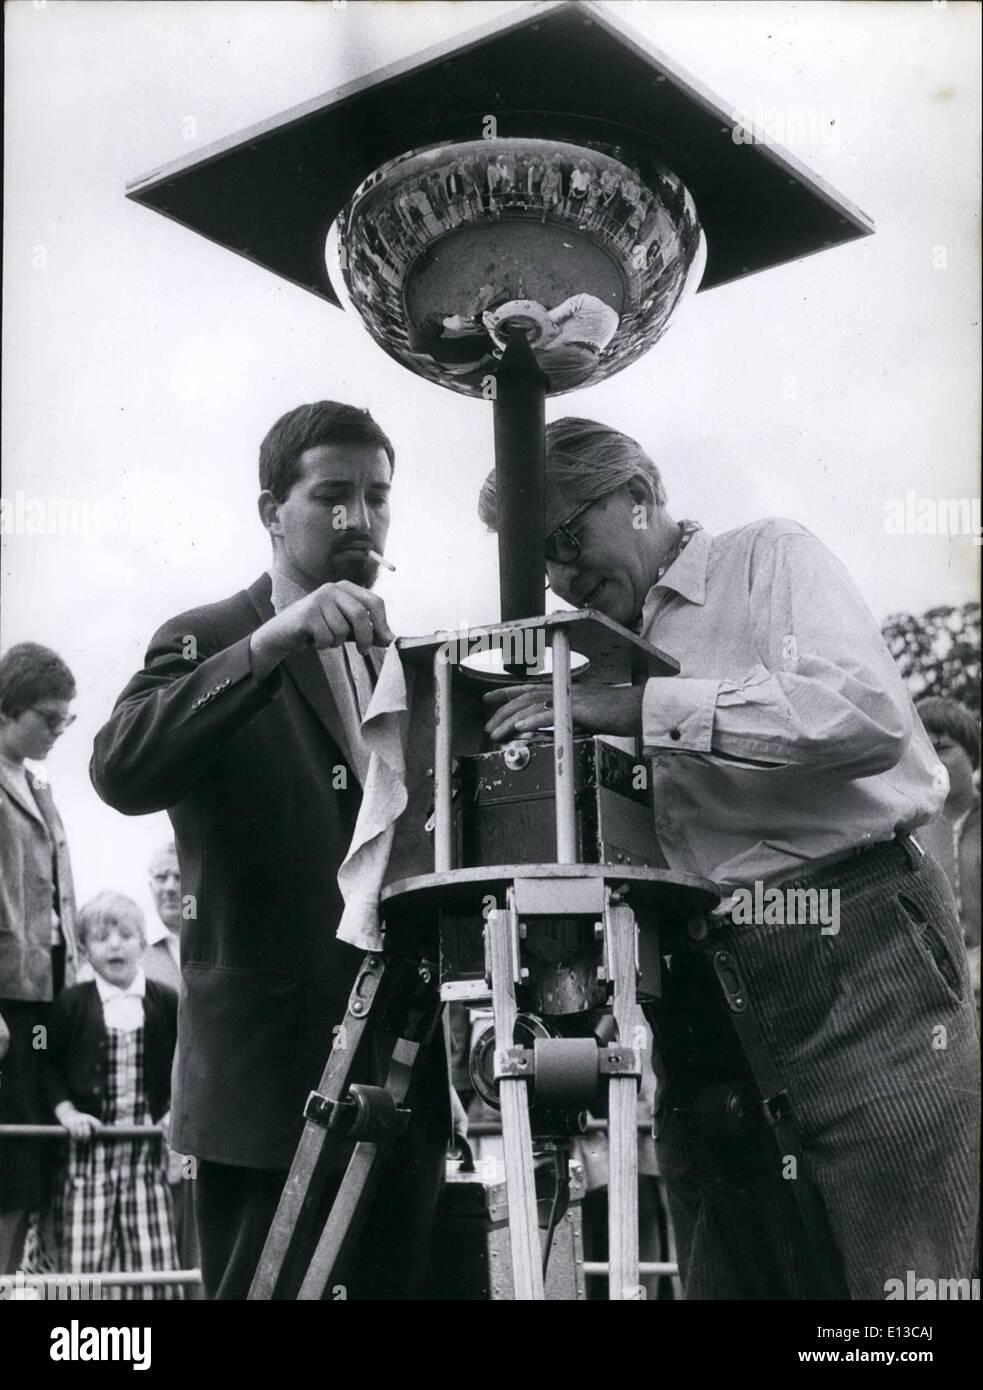 Feb. 29, 2012 - Cinema of the future: Cinetarium: The hemisphere is fastened above the camera. - Stock Image